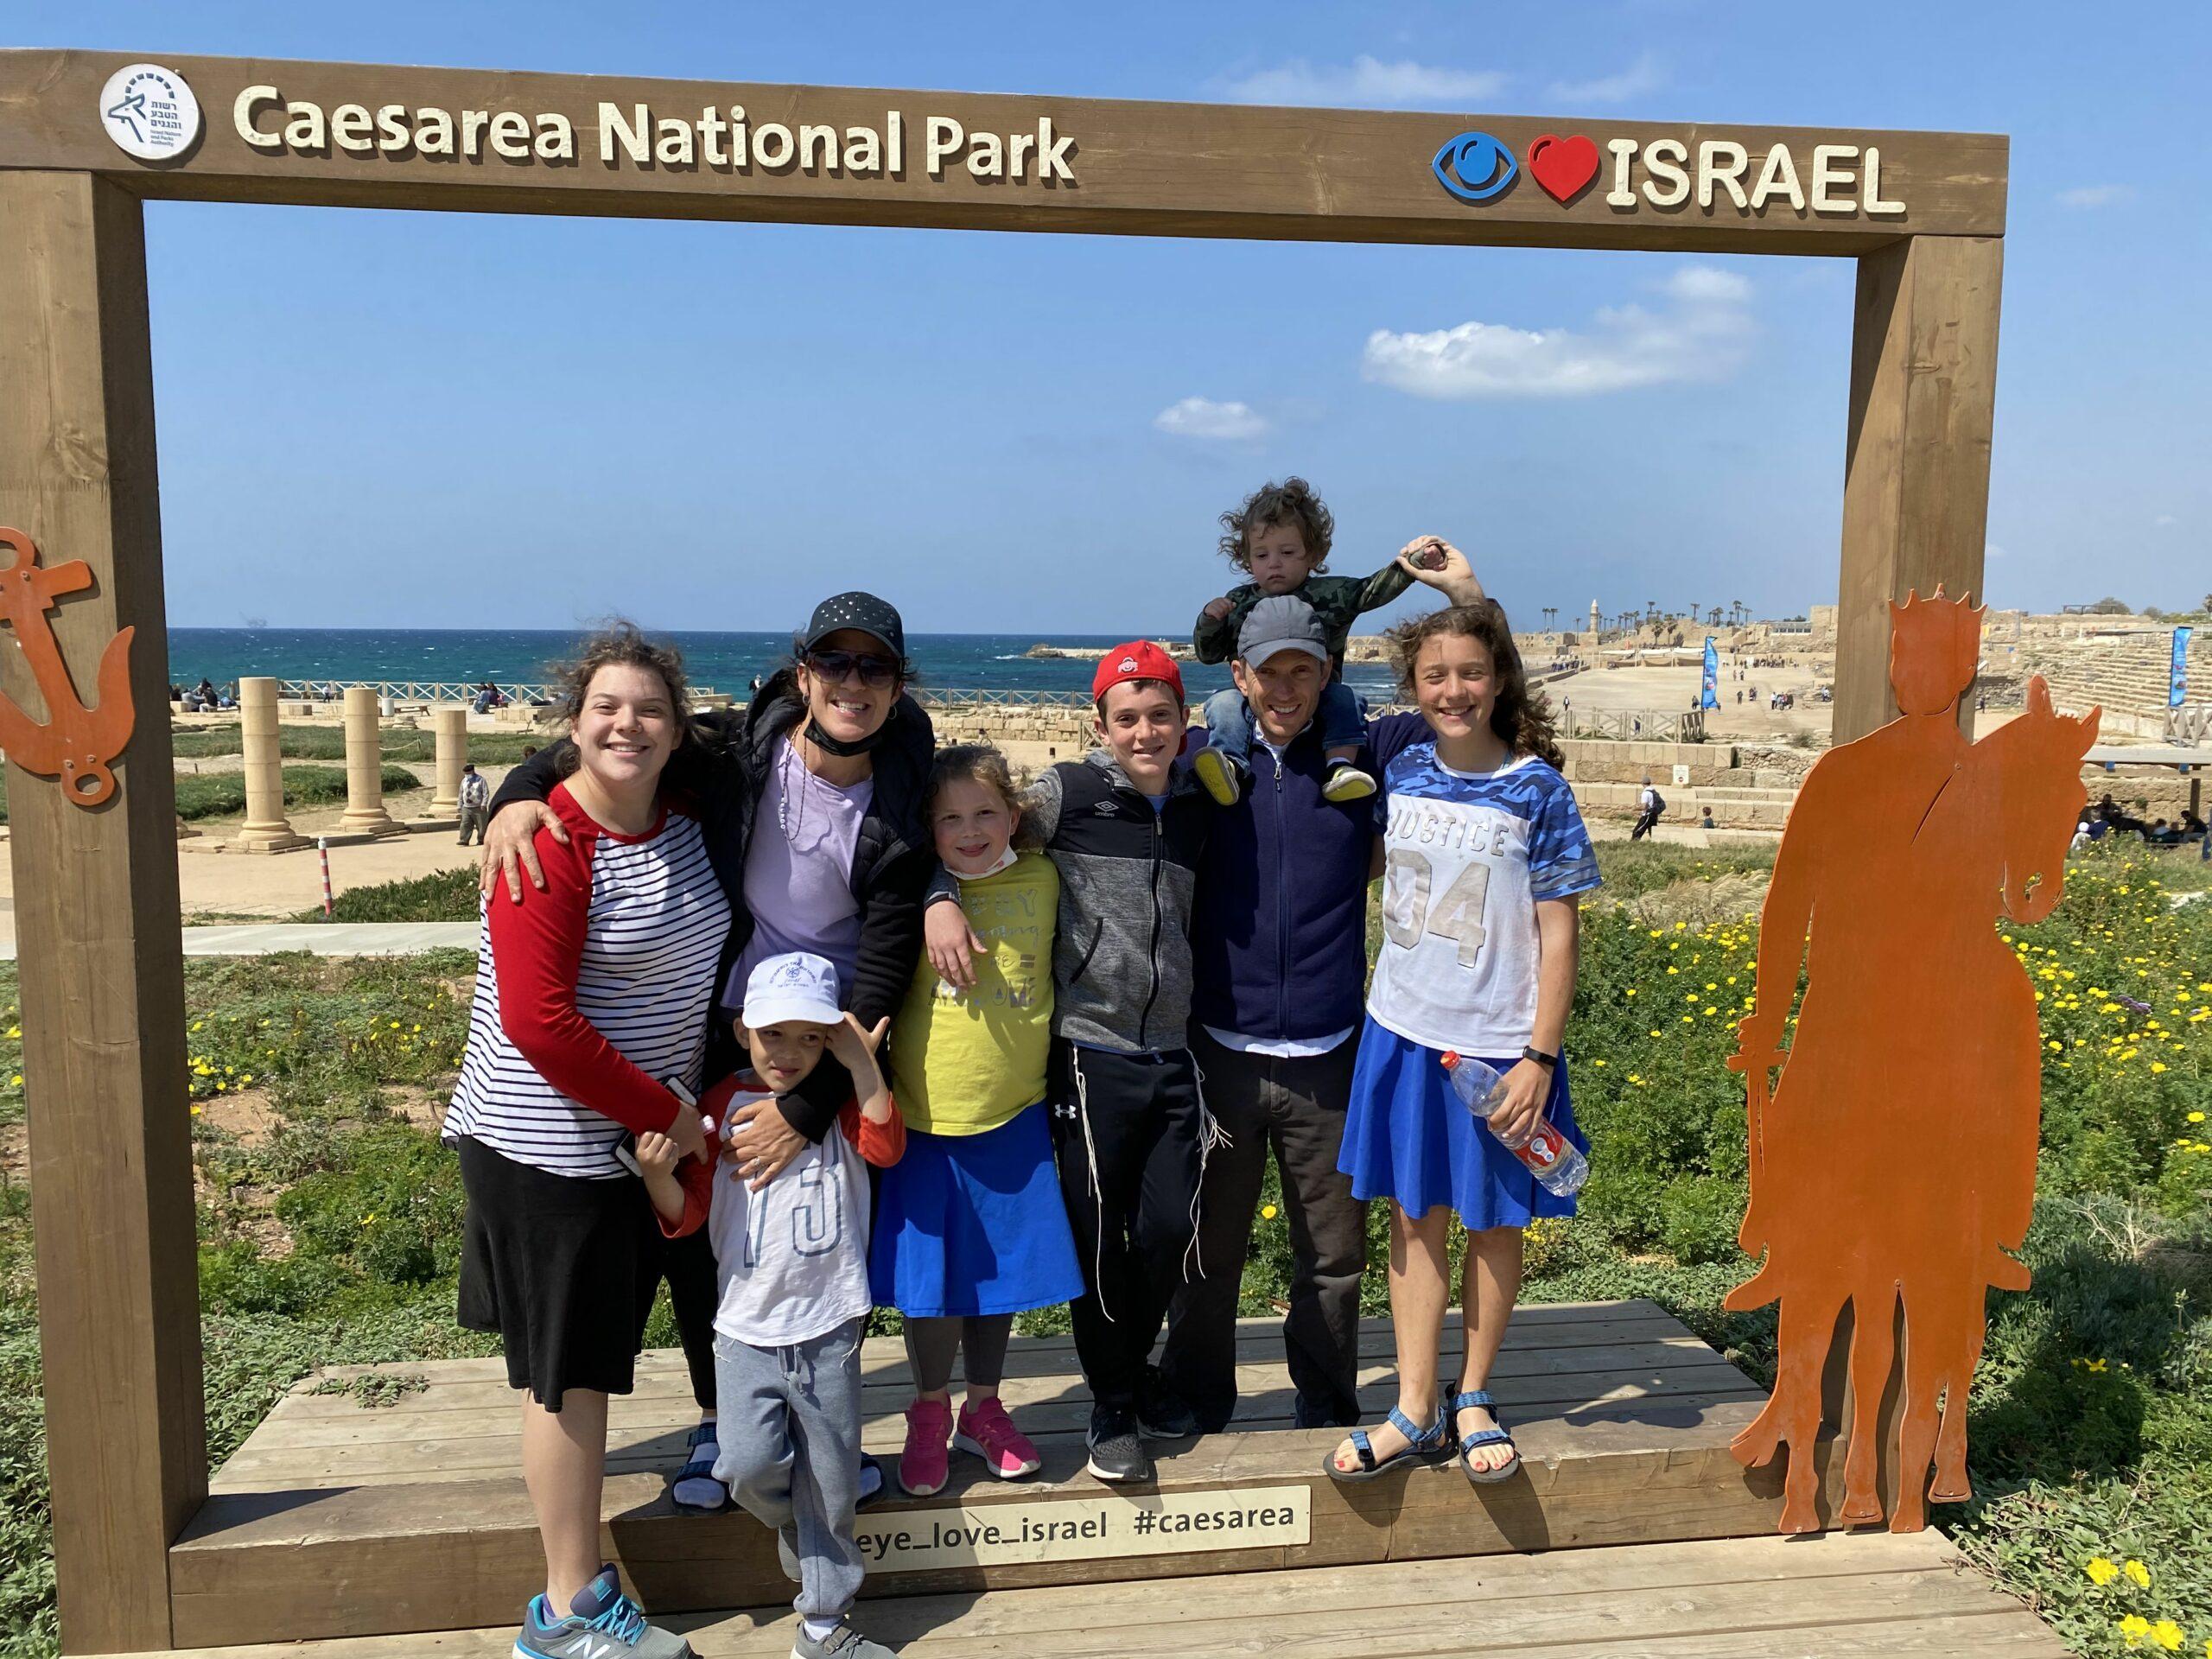 Weisz family enjoying a fun and historical trip to Caesarea National Park